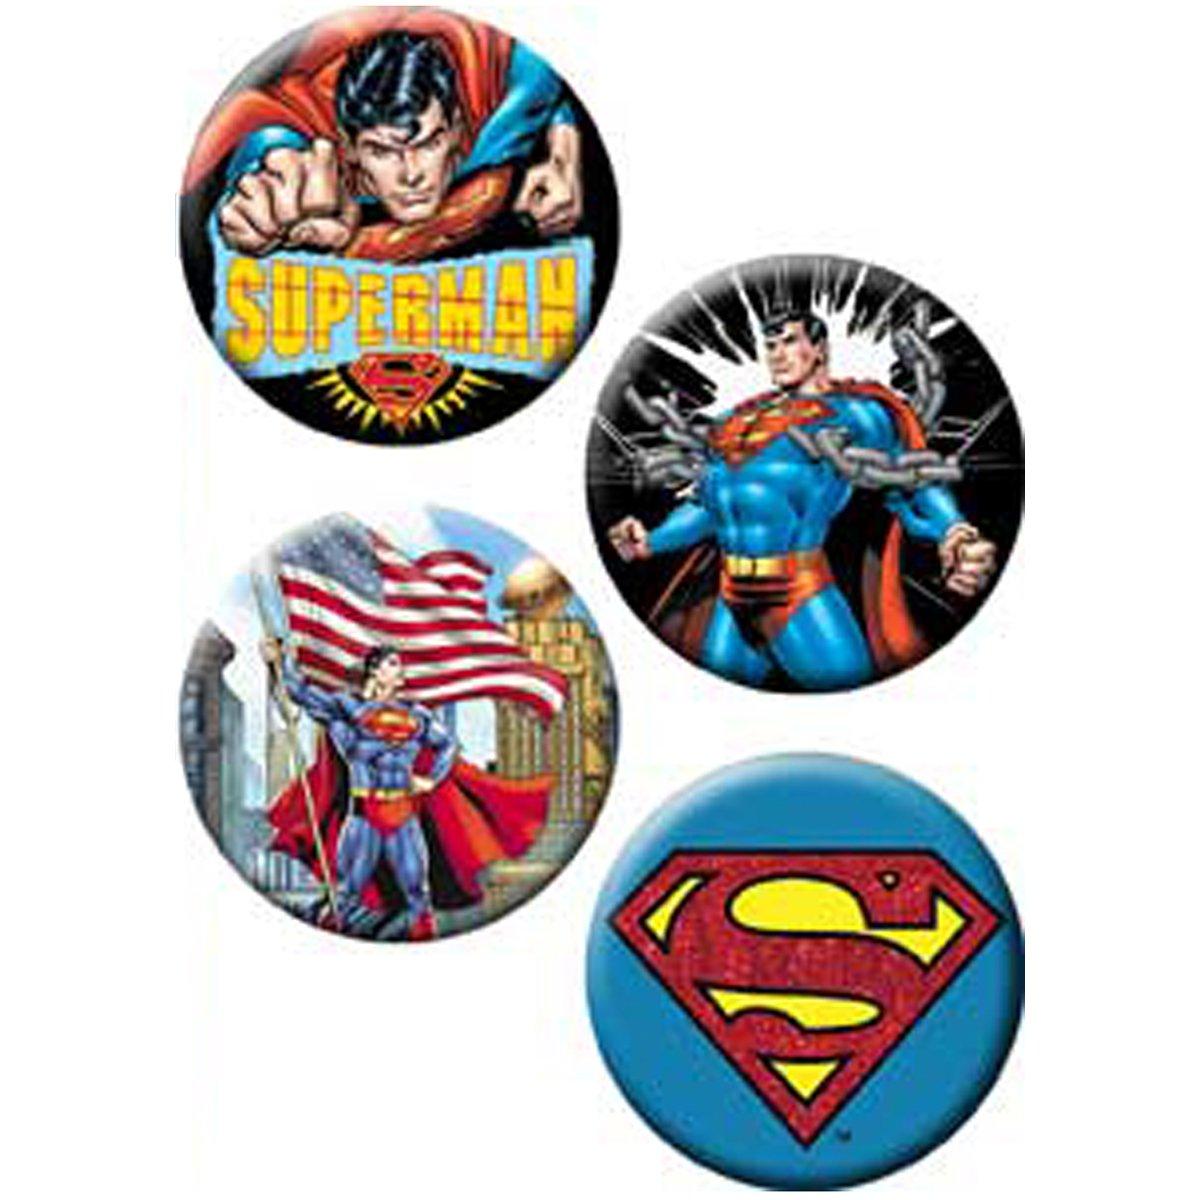 Licenses Products DC Comics Superman Assorted Artworks 1.25' Button Set, 4-Piece C&D Visionary Inc. B-DC-0007-S